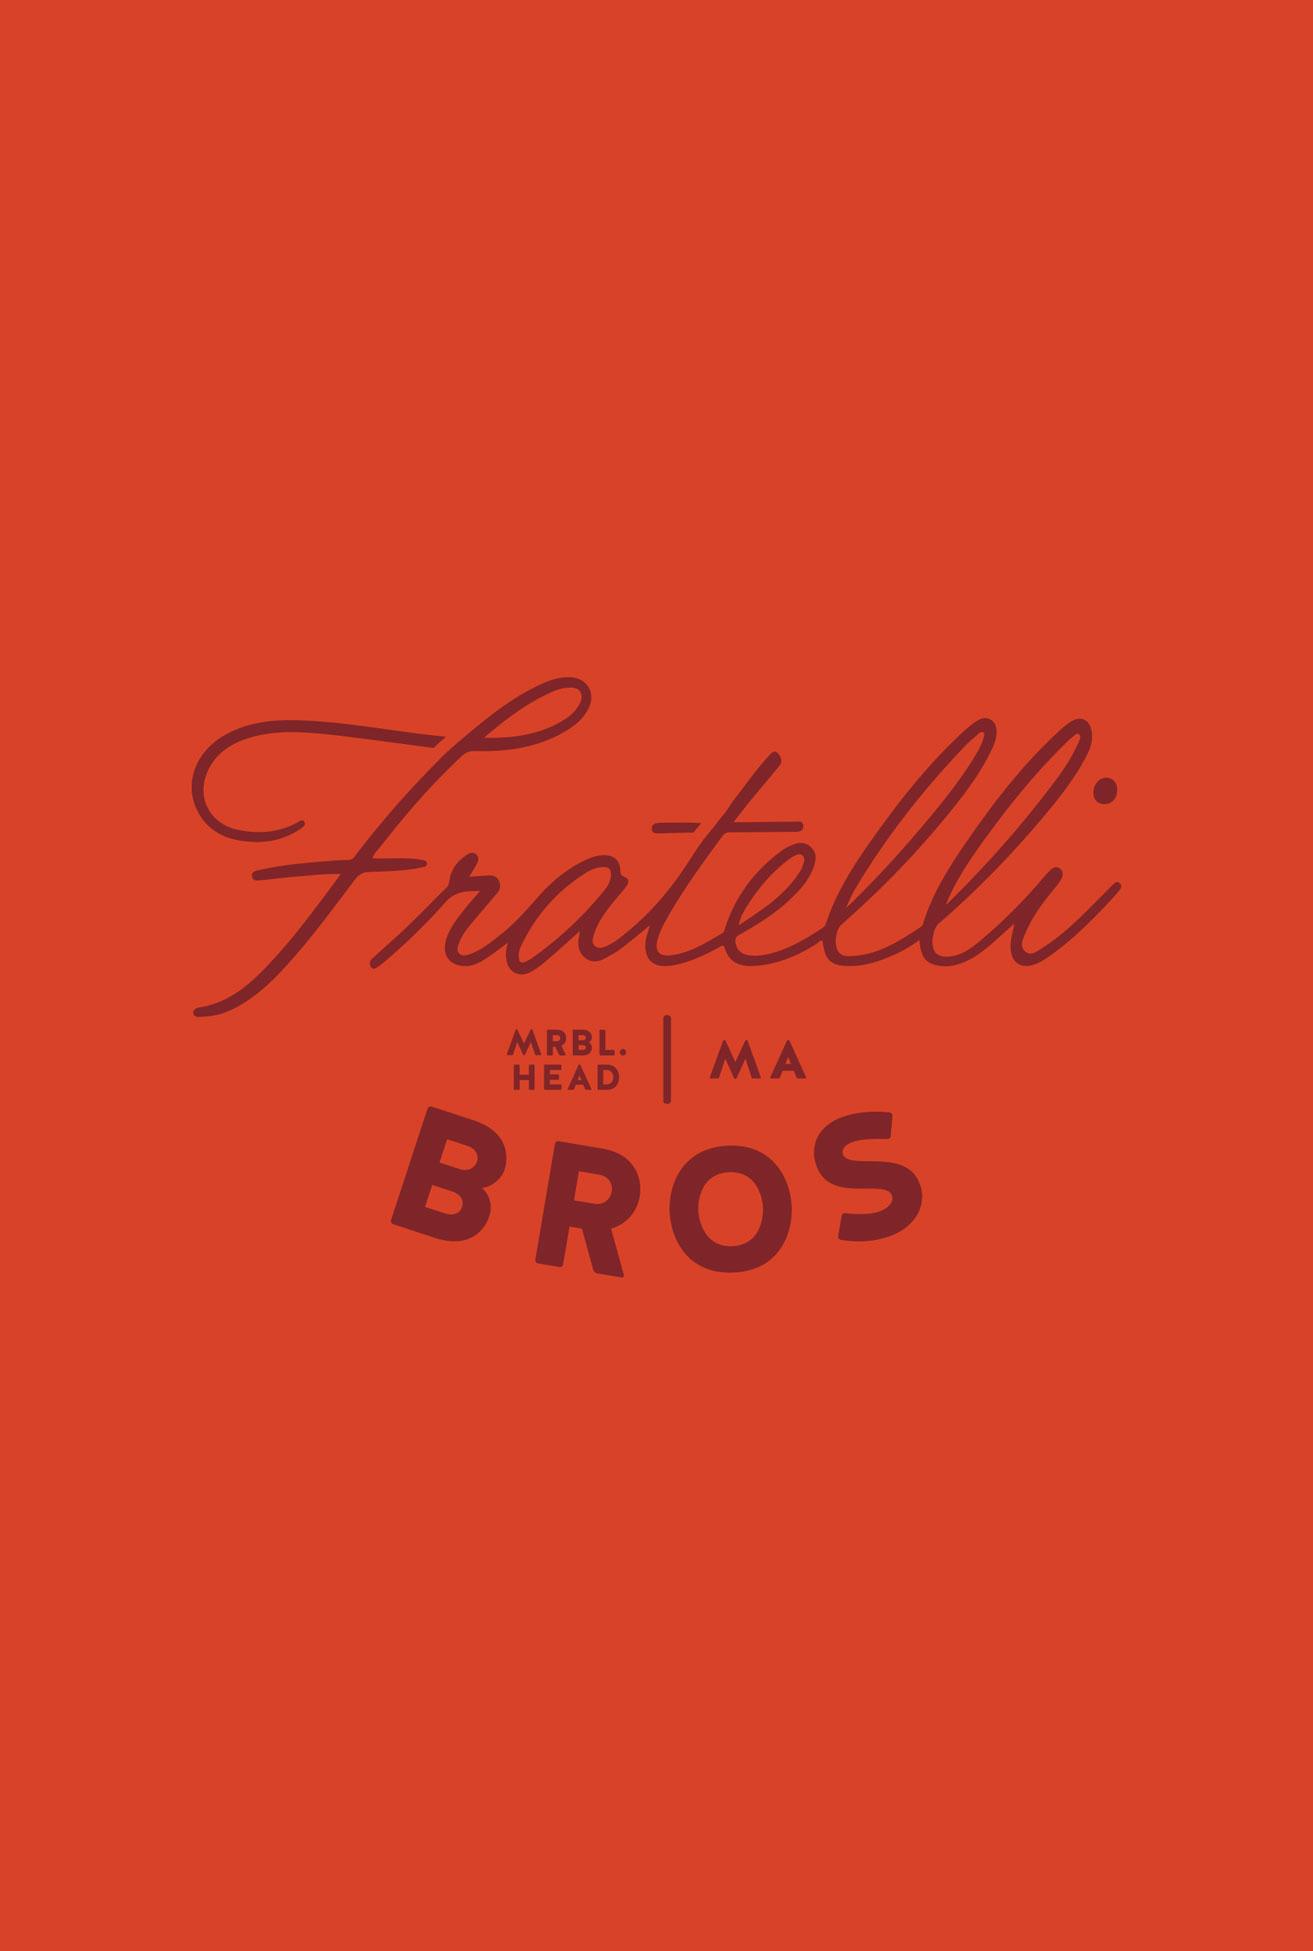 fratellibros-vert_script-logotype.jpg